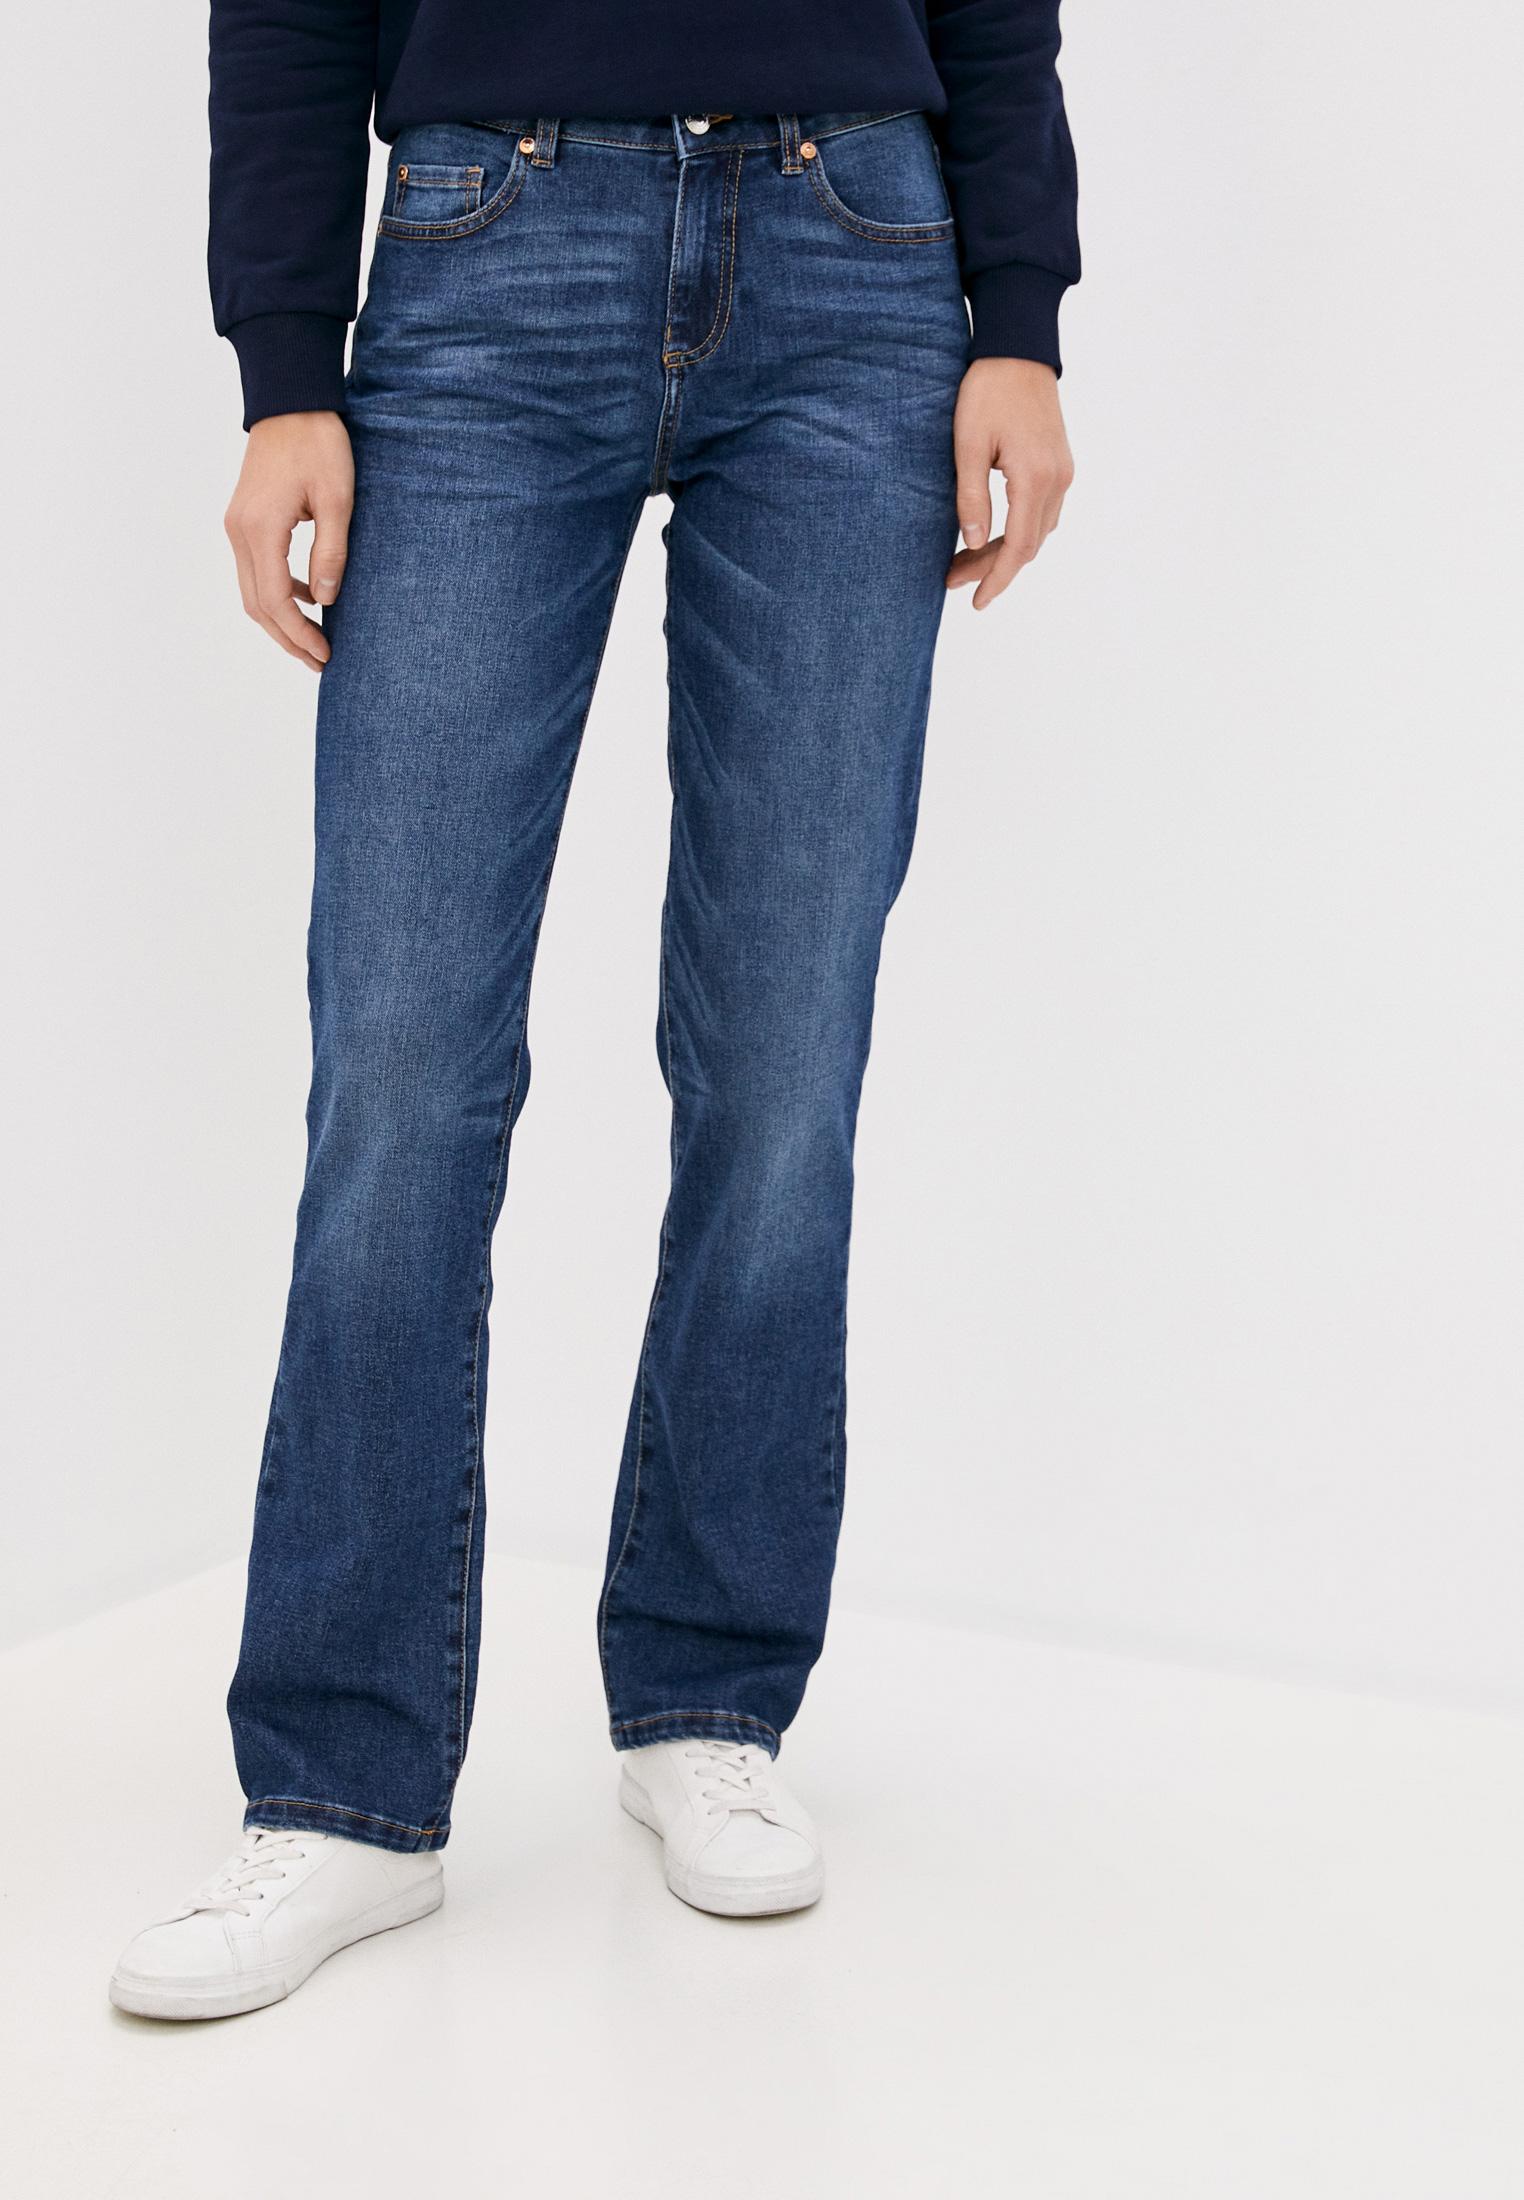 Прямые джинсы United Colors of Benetton (Юнайтед Колорс оф Бенеттон) 4DHH574W3